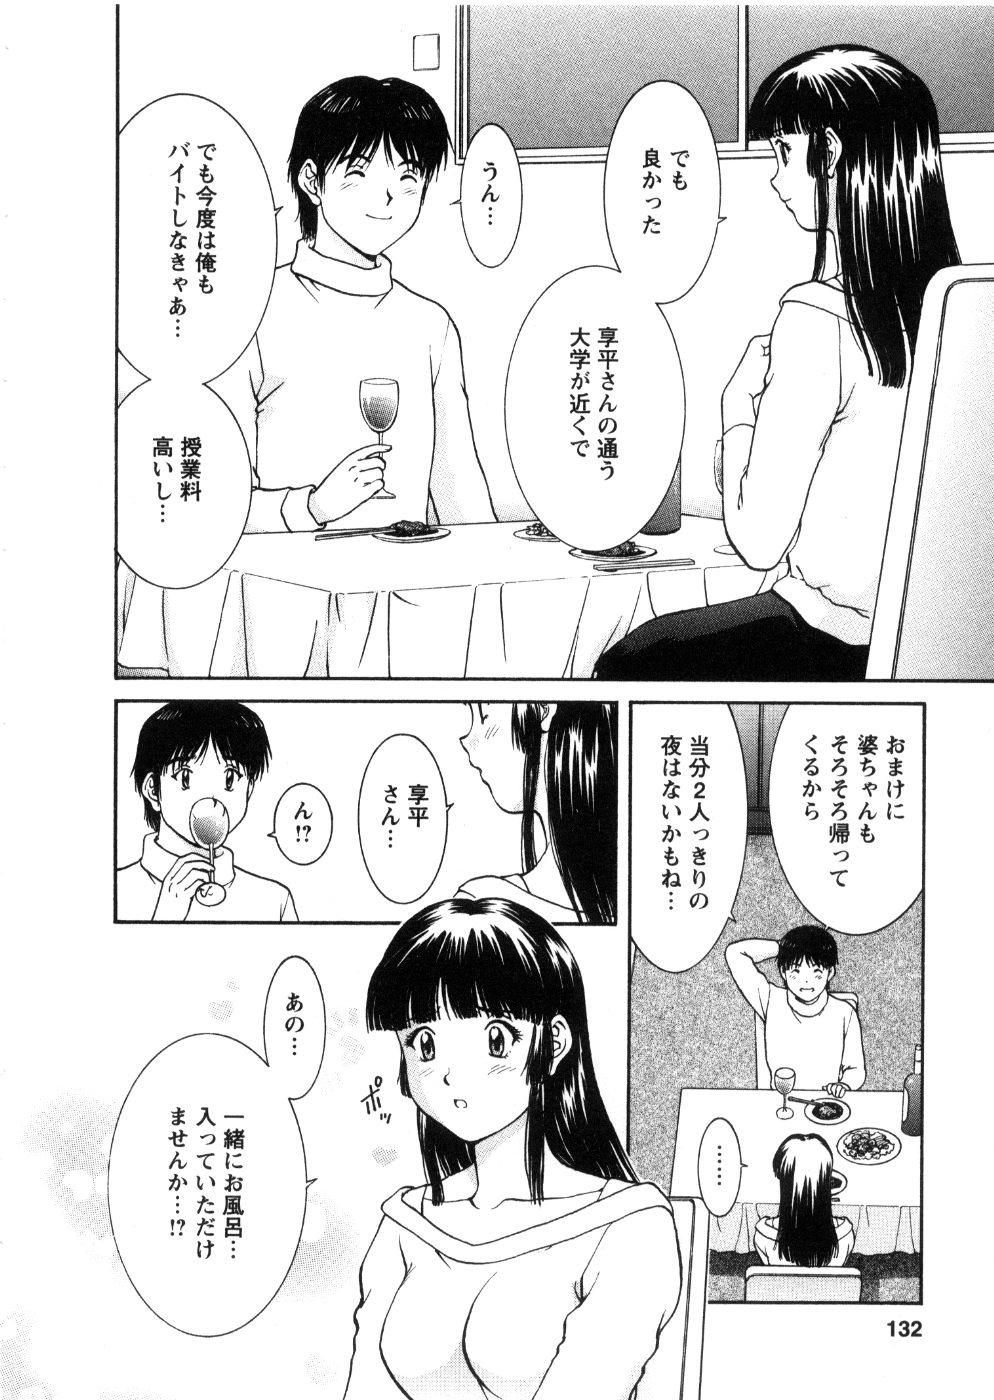 Oneechan-tachi ga Yatte Kuru 03 133